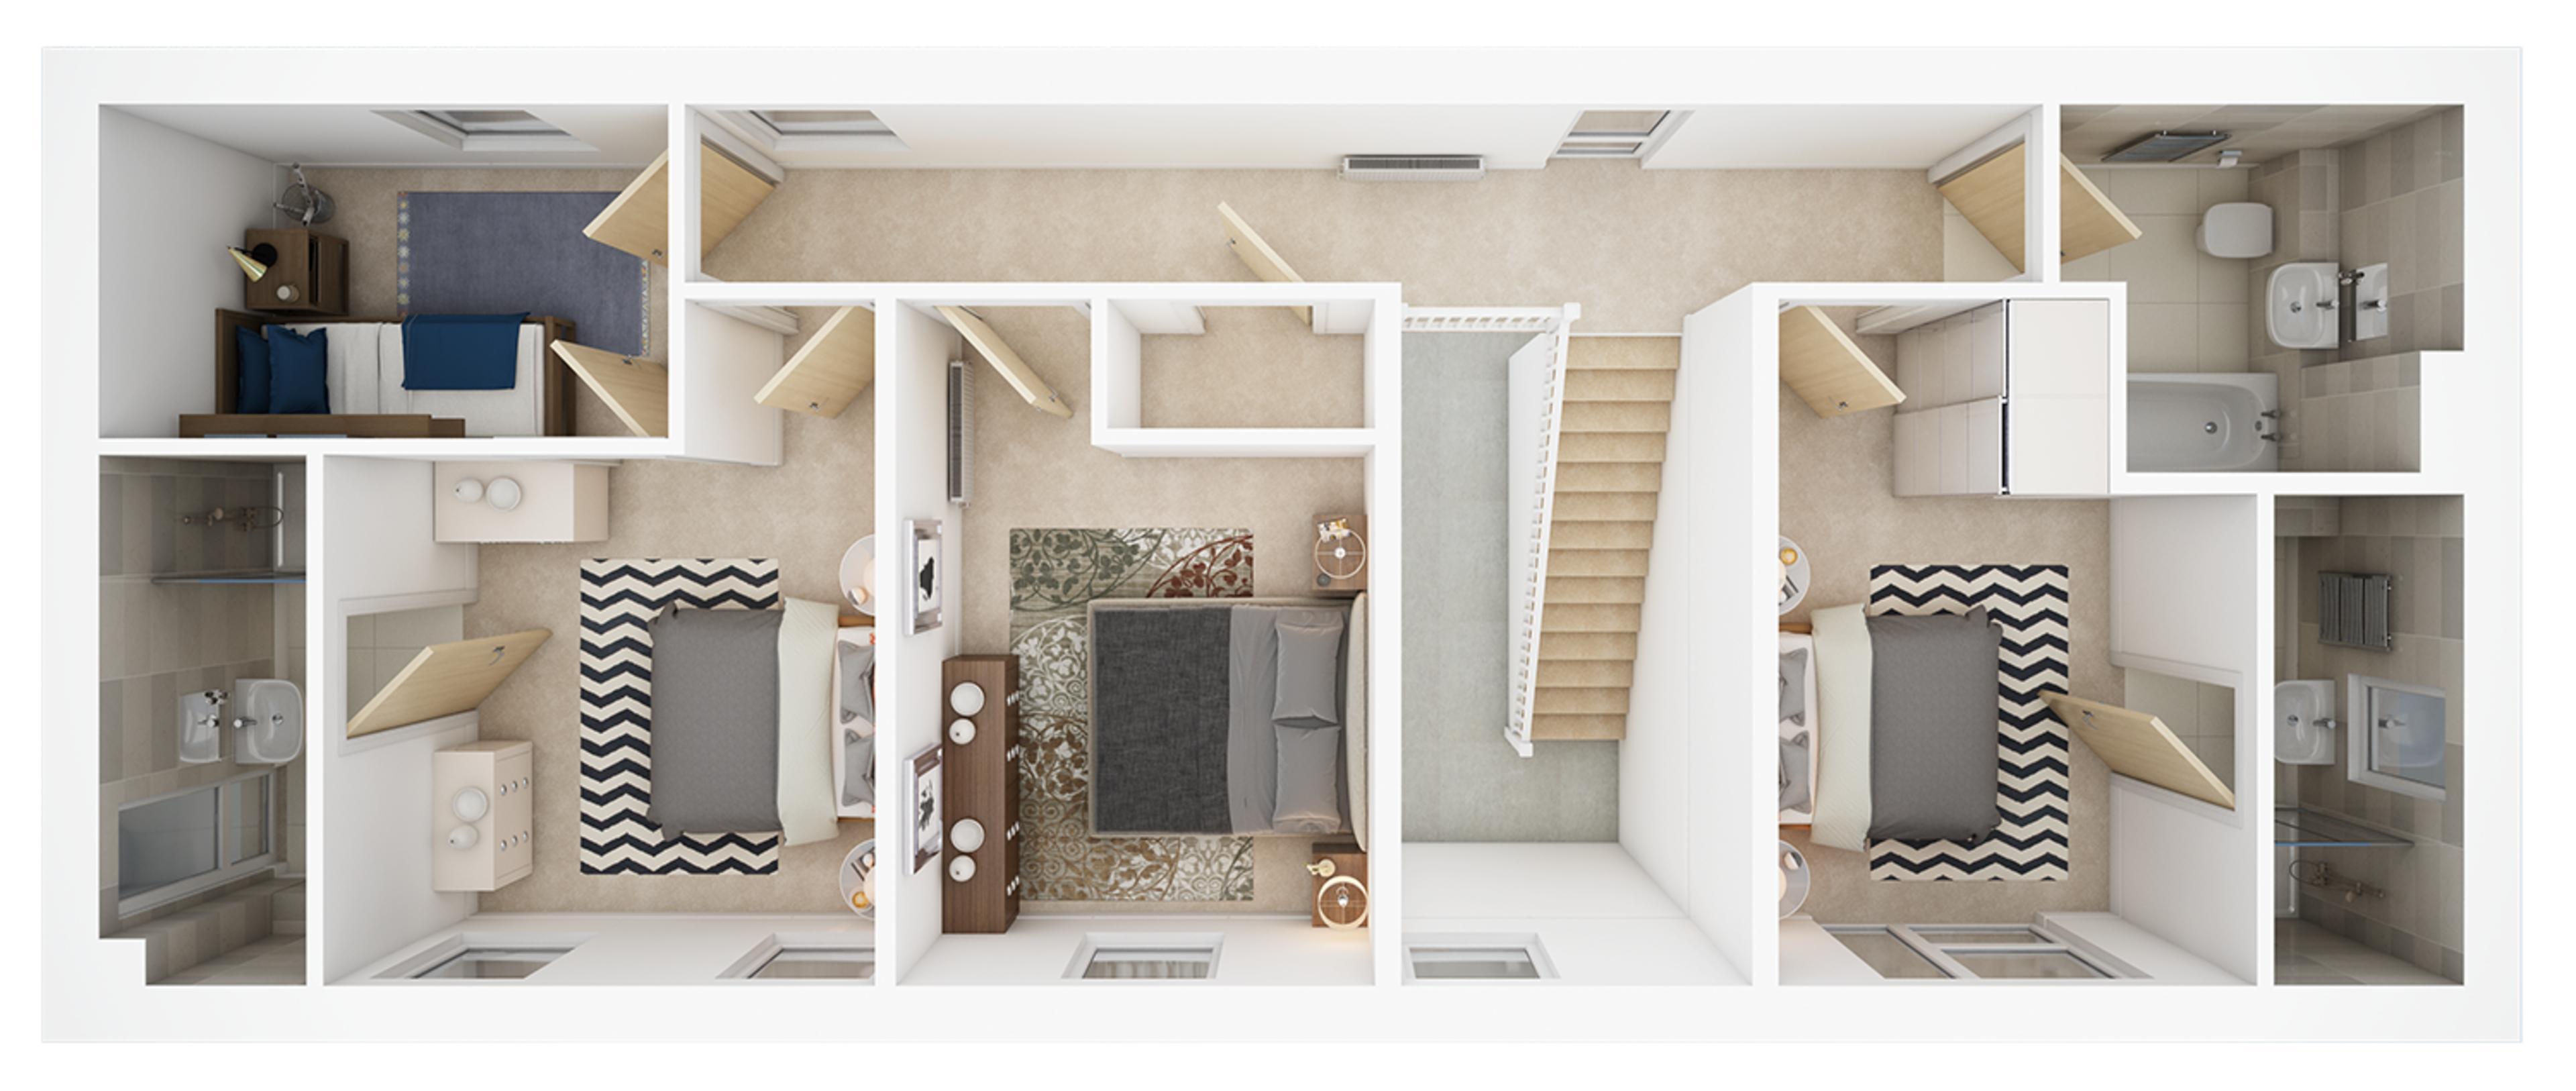 Watling Grange > Merevale > First floor